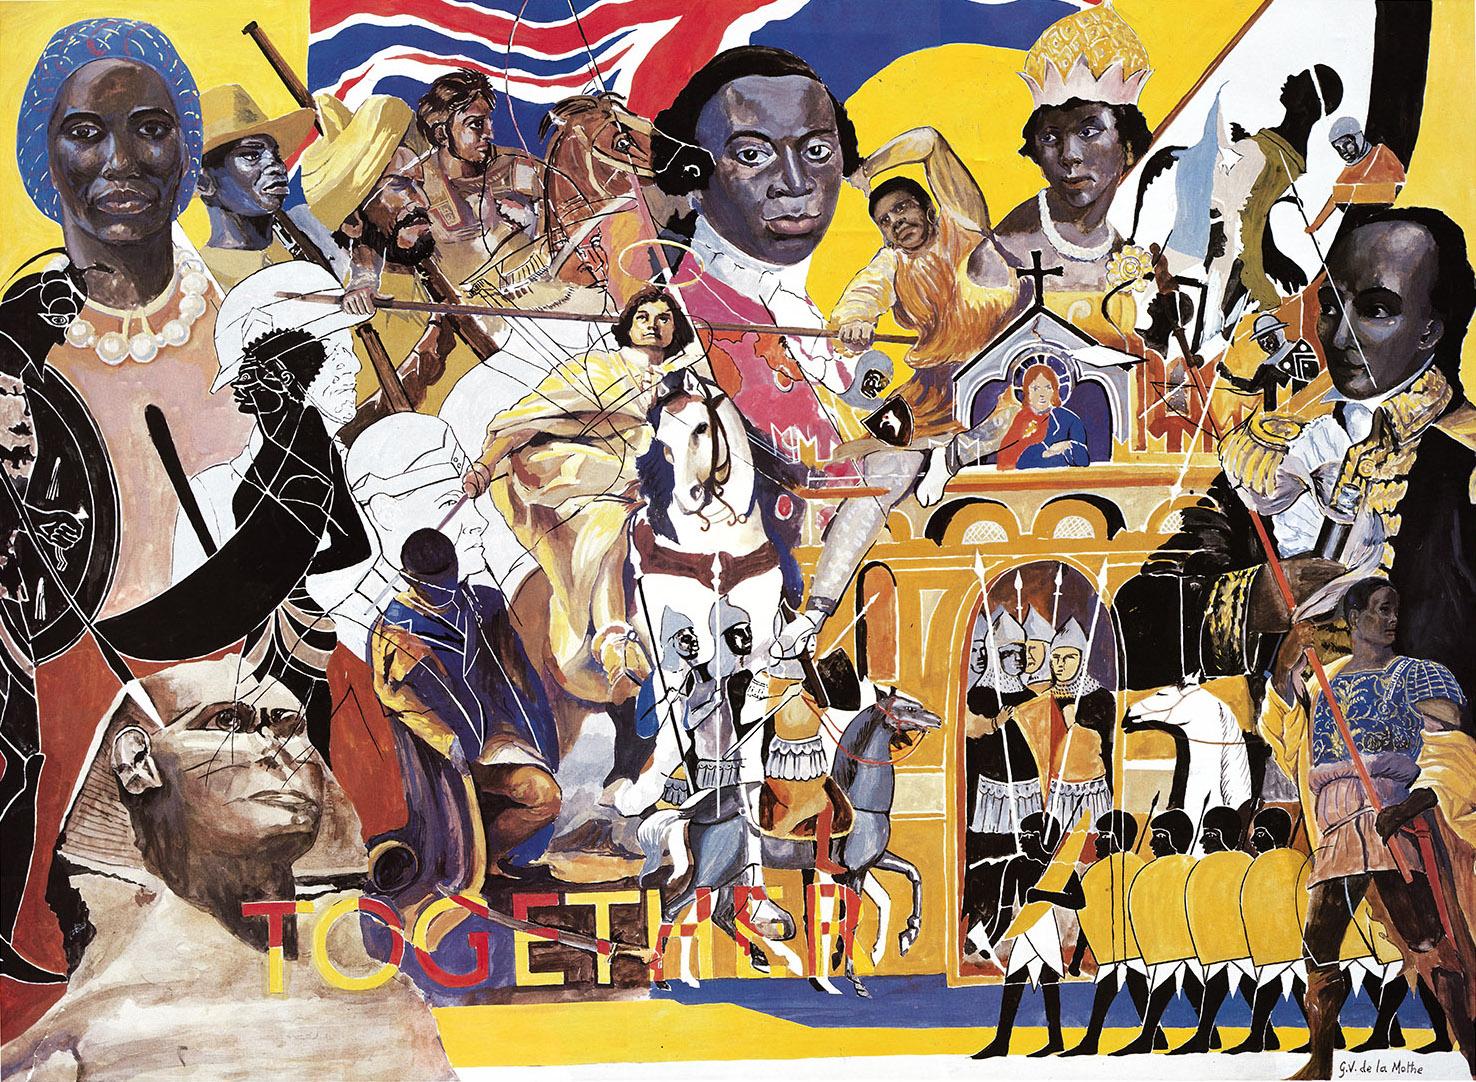 Sebuah poster oleh Gordon de la Mothe menunjukkan lukisan tokoh kulit hitam dari sejarah dan zaman kuno, termasuk jenderal Haiti Toussaint L'Ouverture dan abolisionis Olaudah Equiano, di samping Union Jack, Sphinx dan kata 'Bersama'